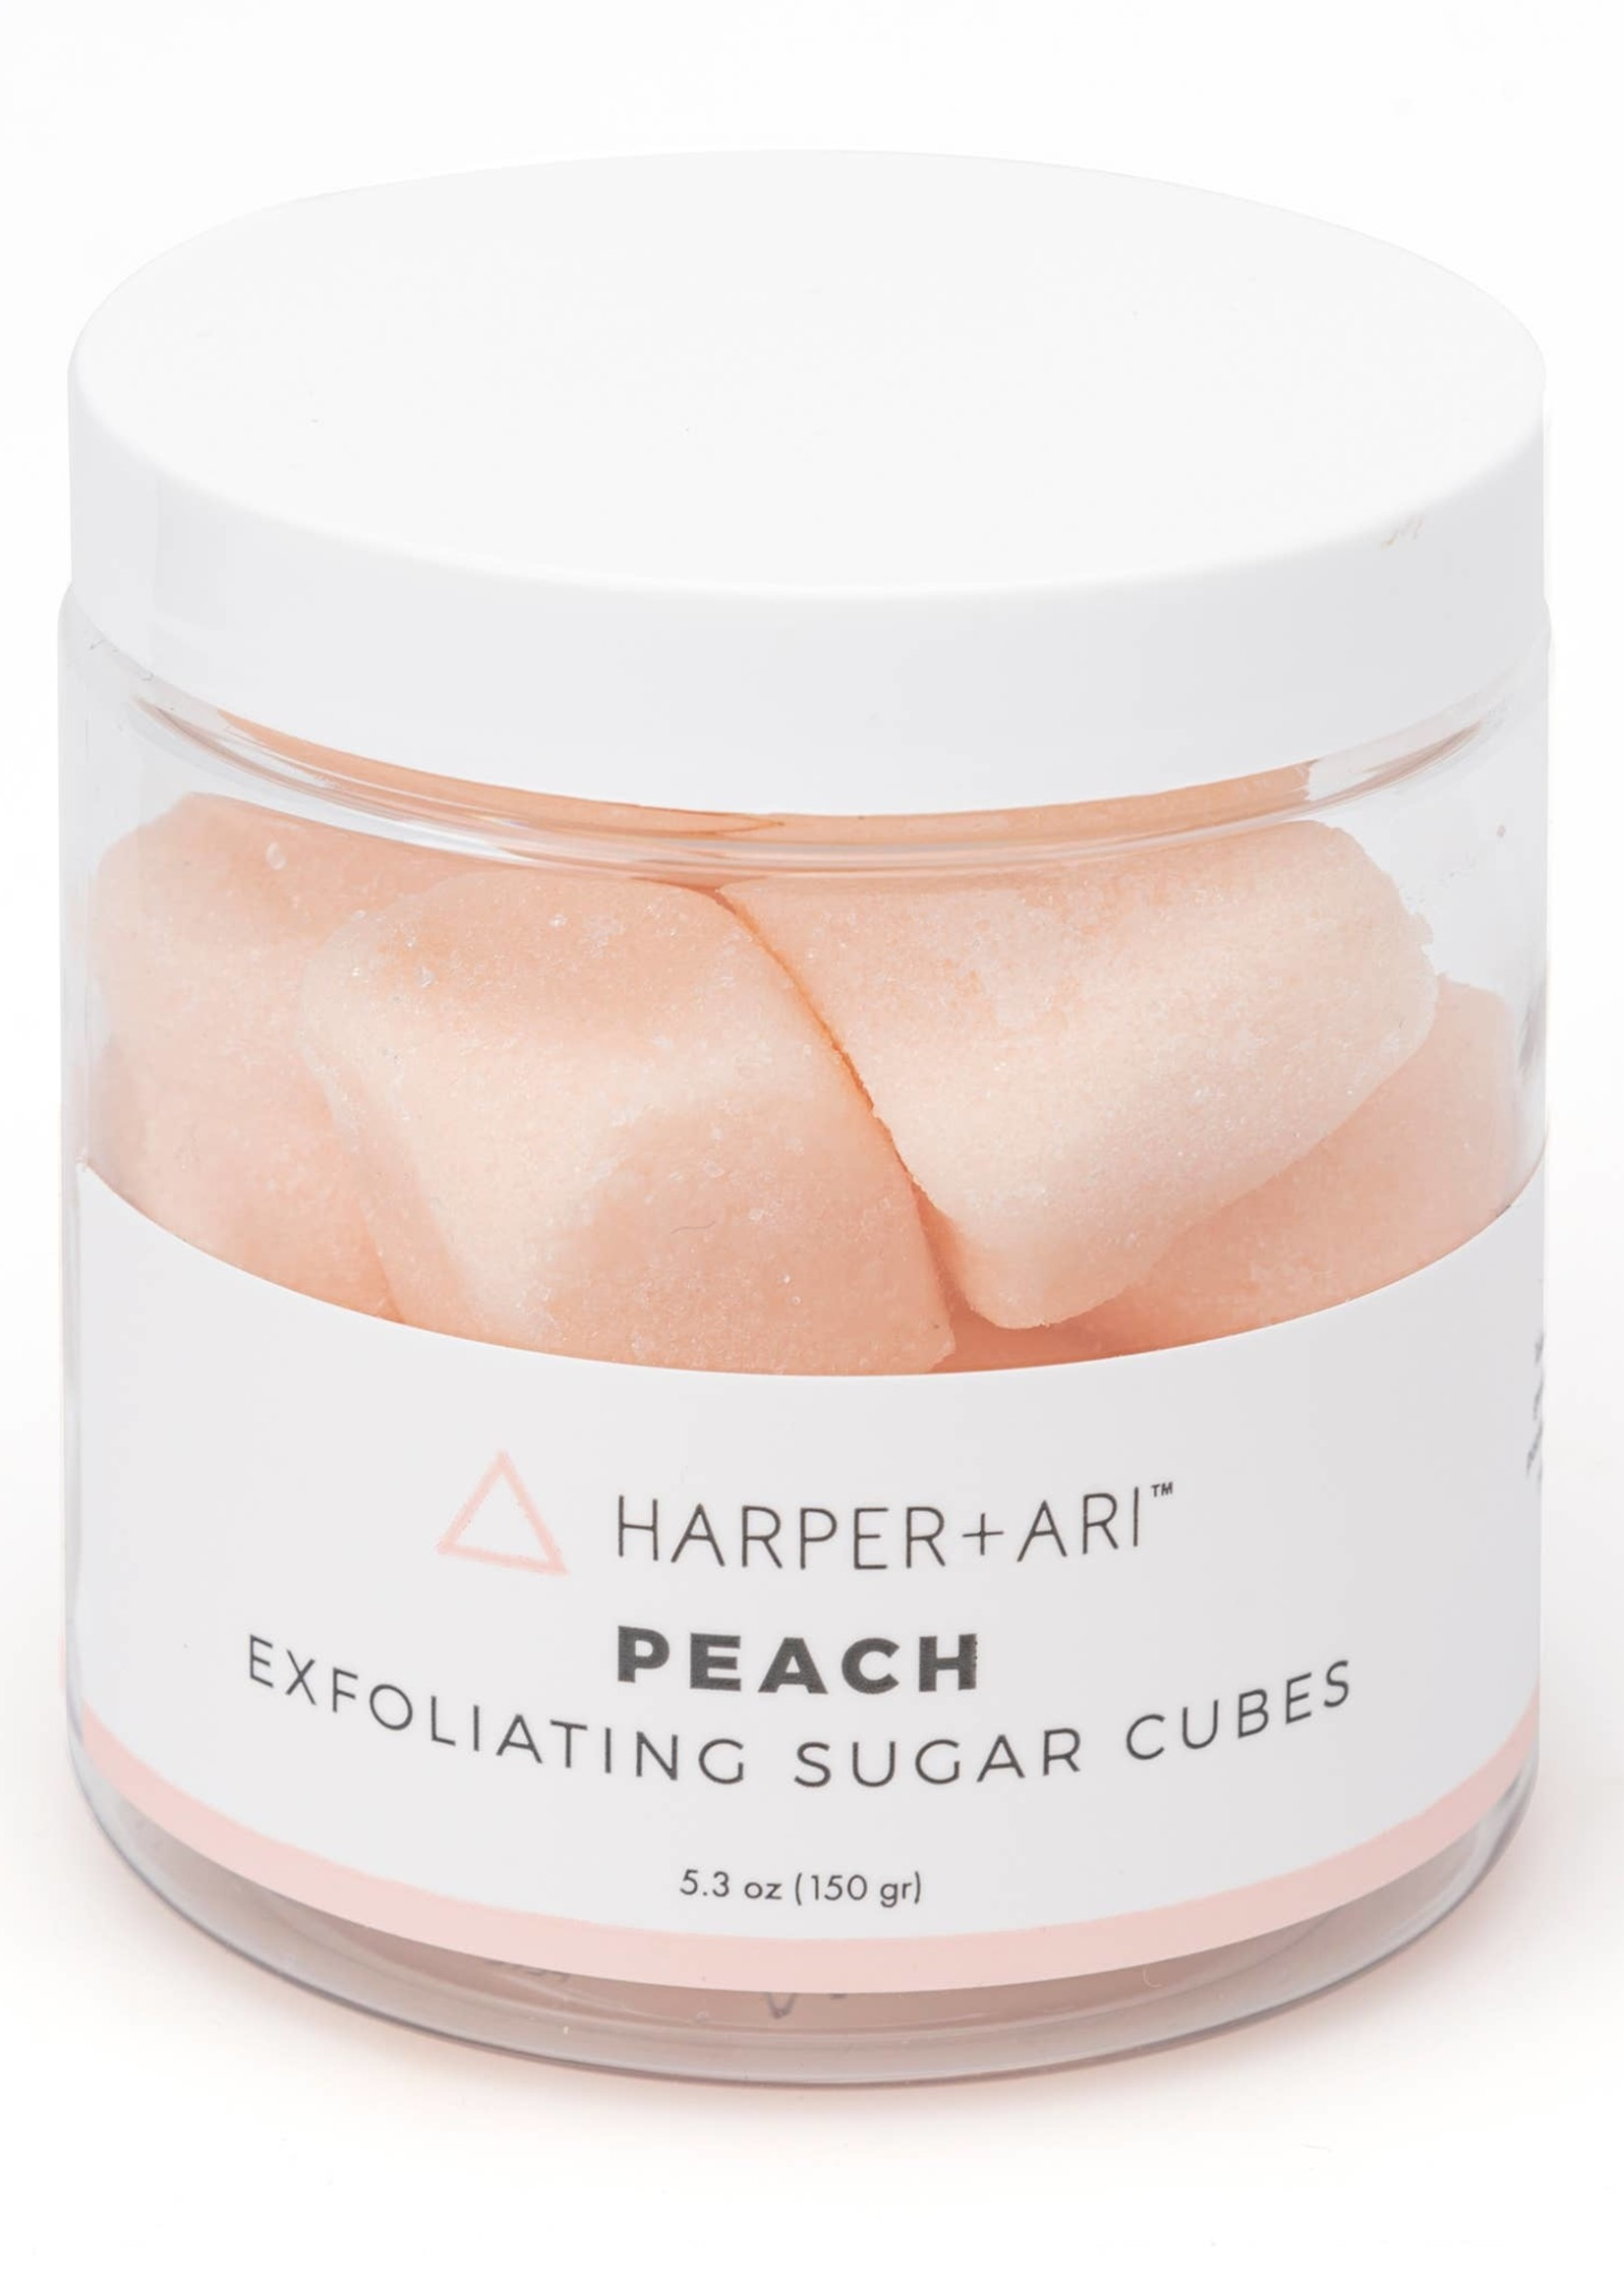 Harper + Ari Peach Exfoliating Sugar Cubes 5.3 oz